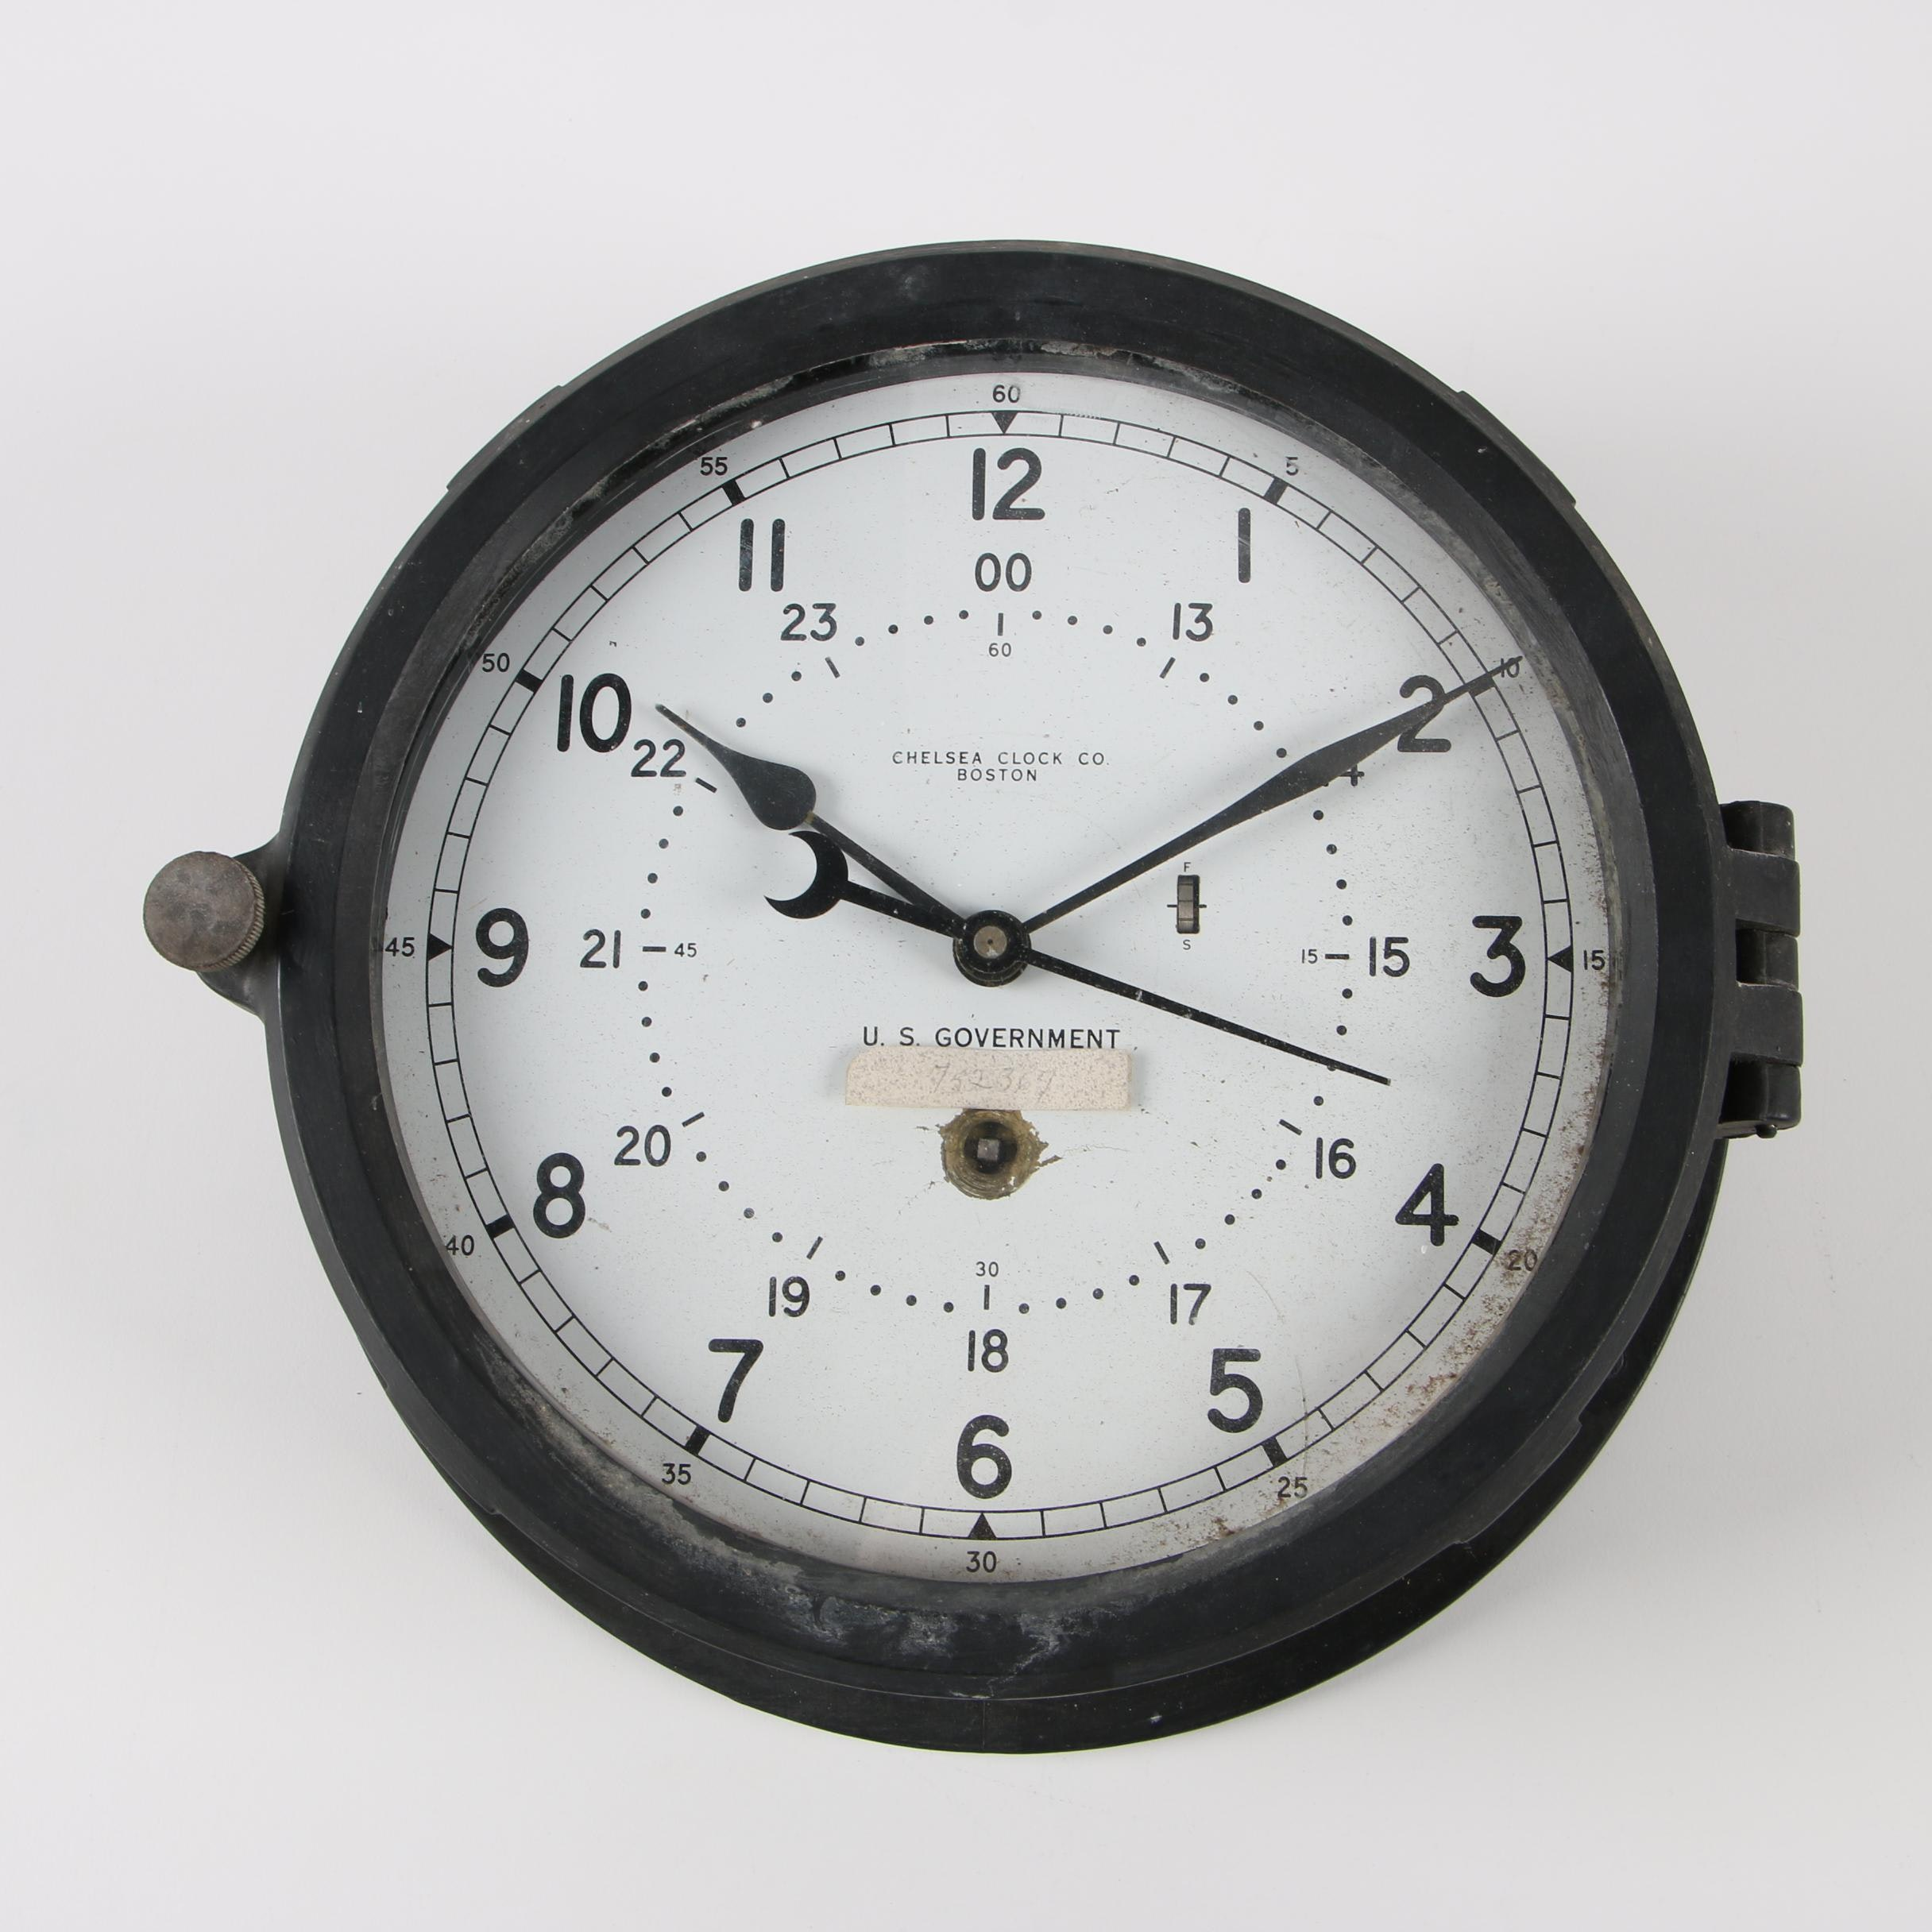 Chelsea Clock Co. U.S. Government Issue Ship Clock